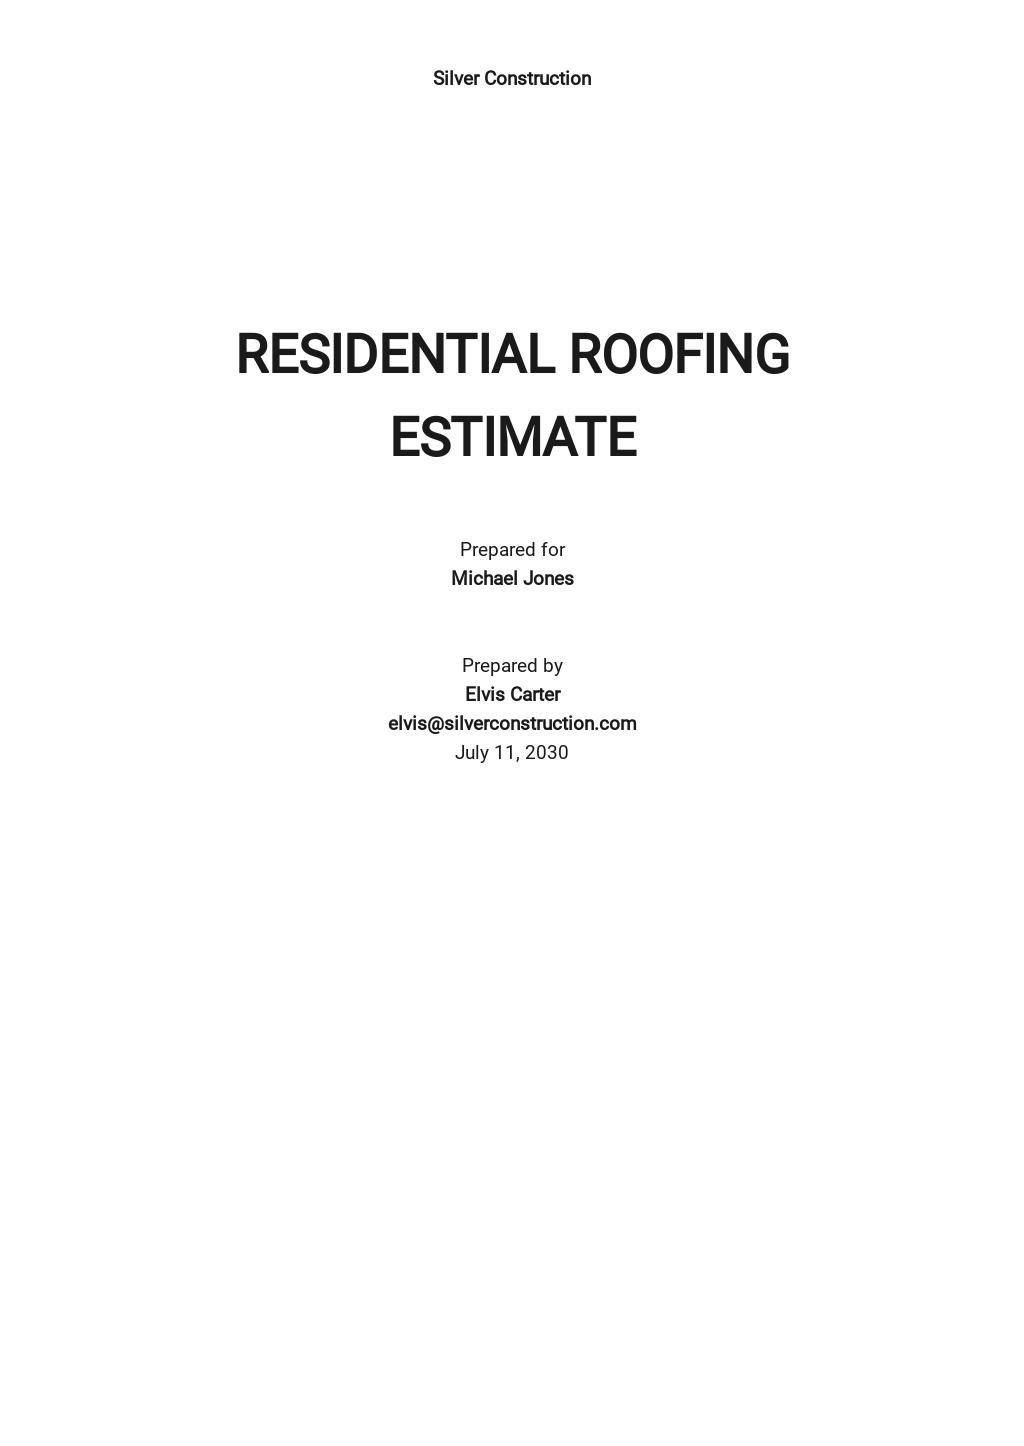 Residential Roofing Estimate Template.jpe